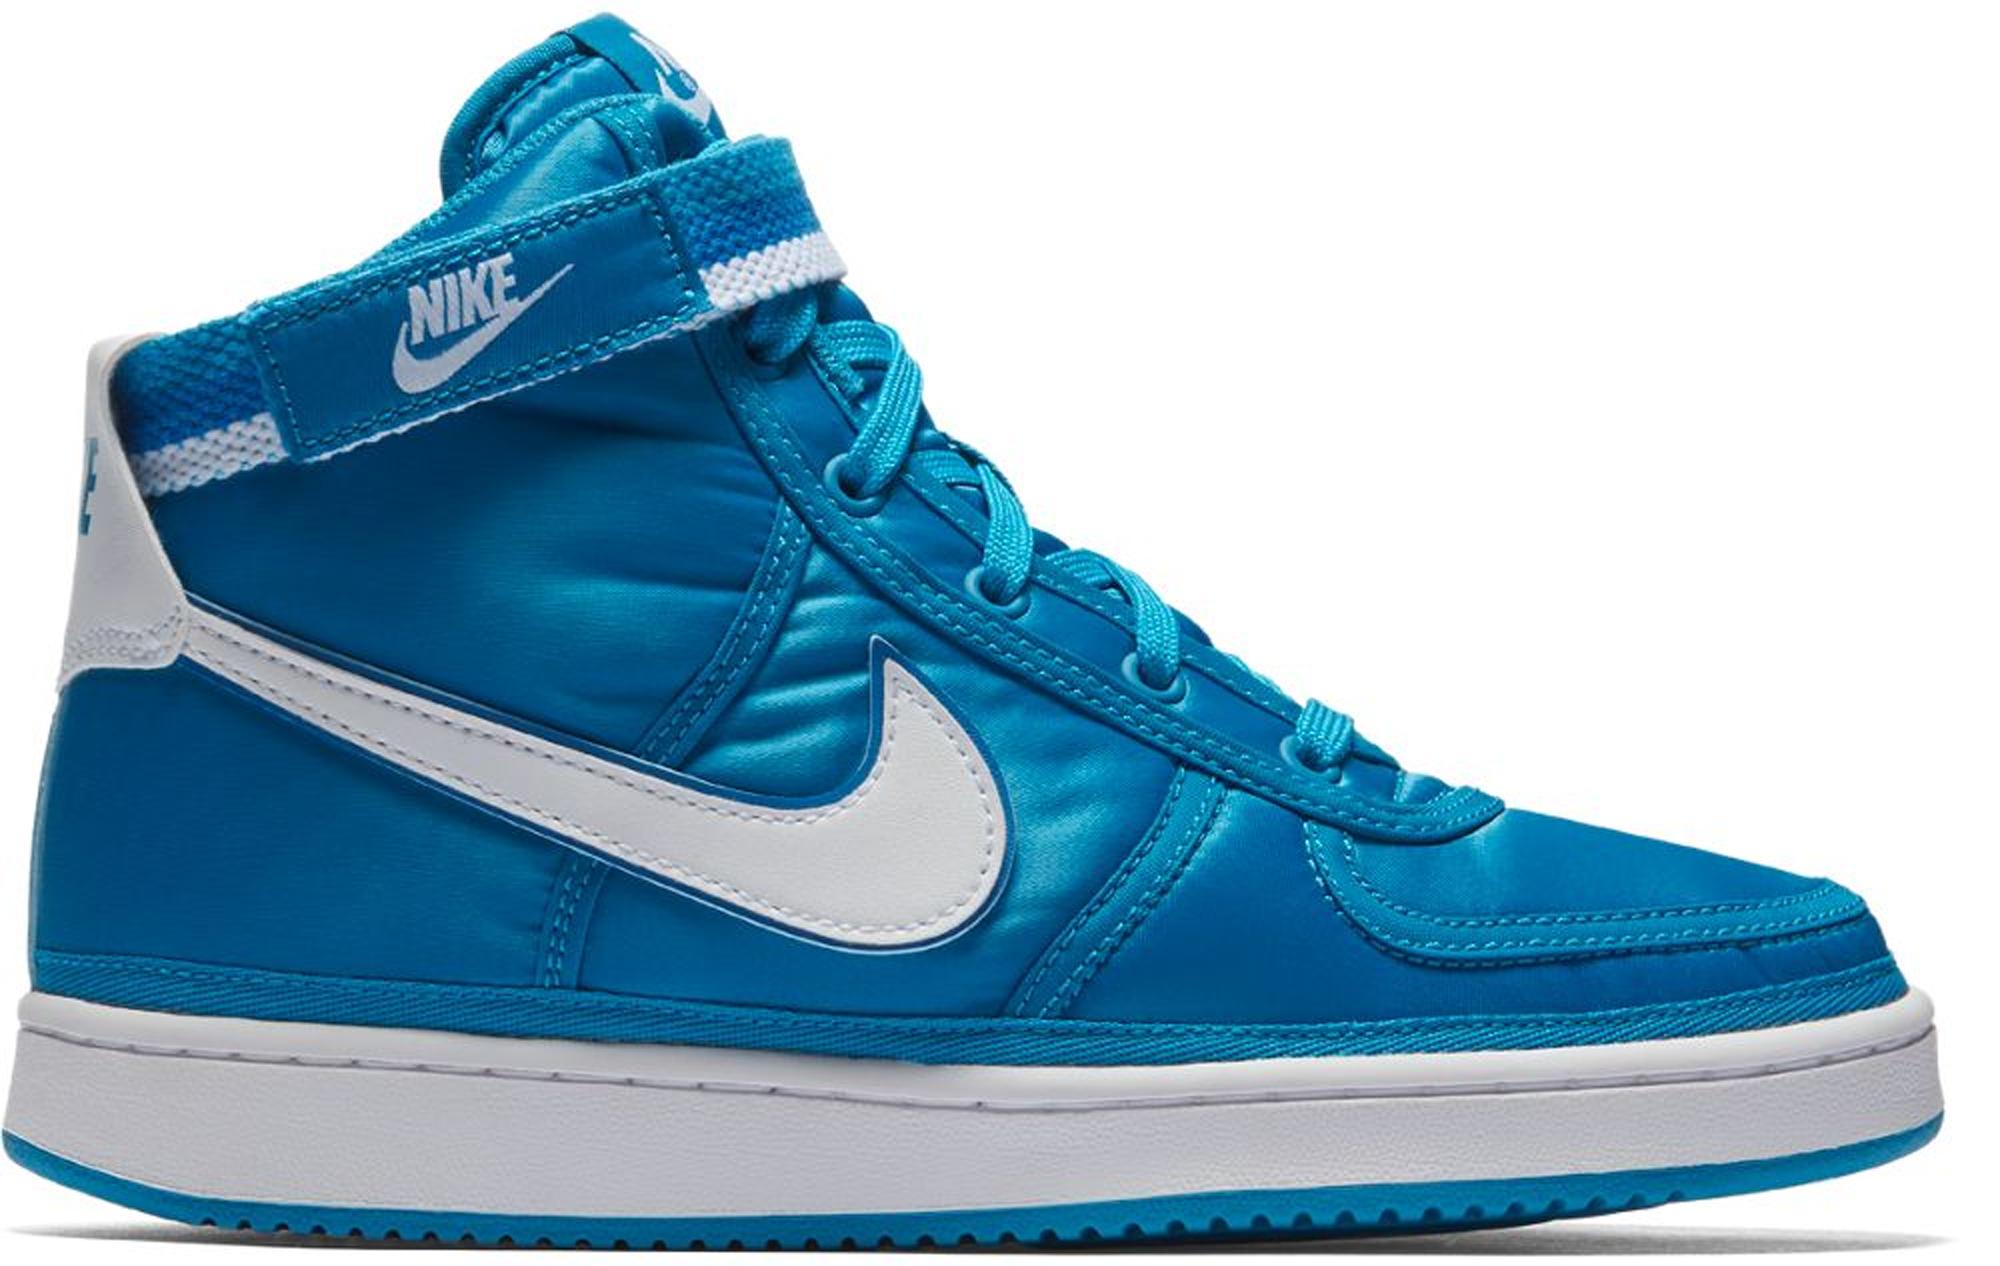 Nike Vandal High Supreme Blue Orbit (GS